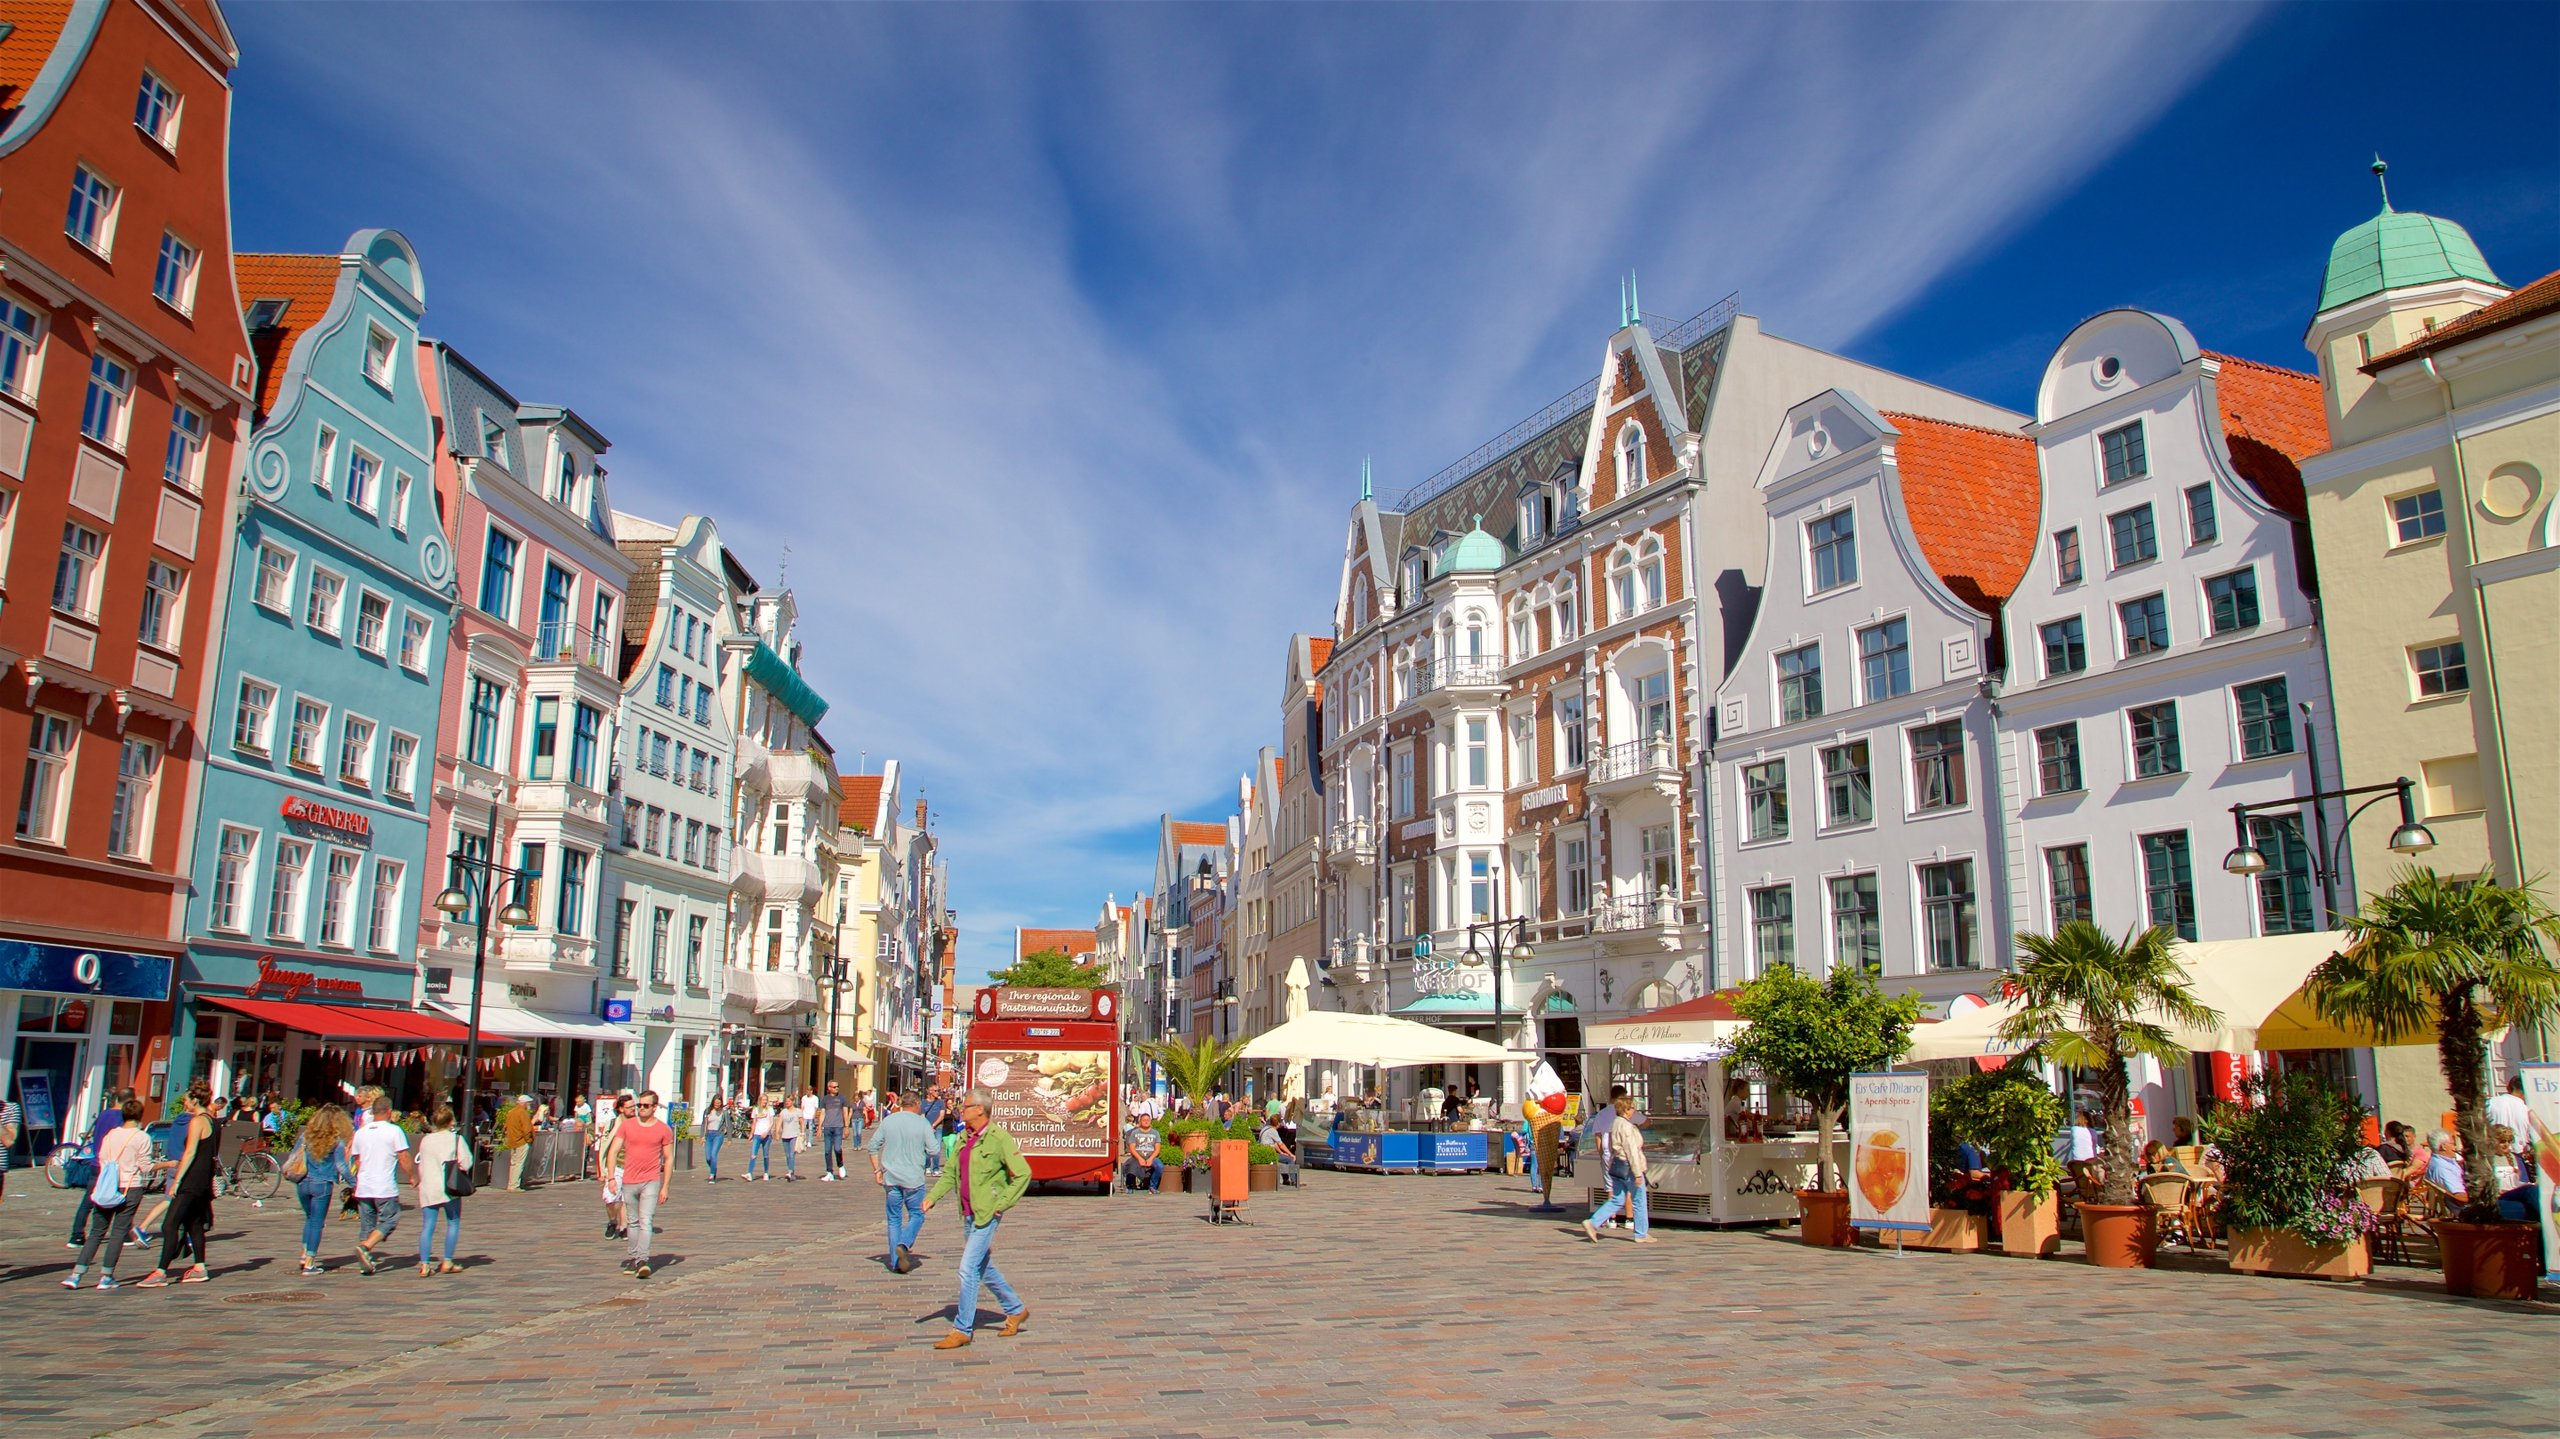 Nördliche Altstadt, Rostock, Mecklenburg-West Pomerania, Germany